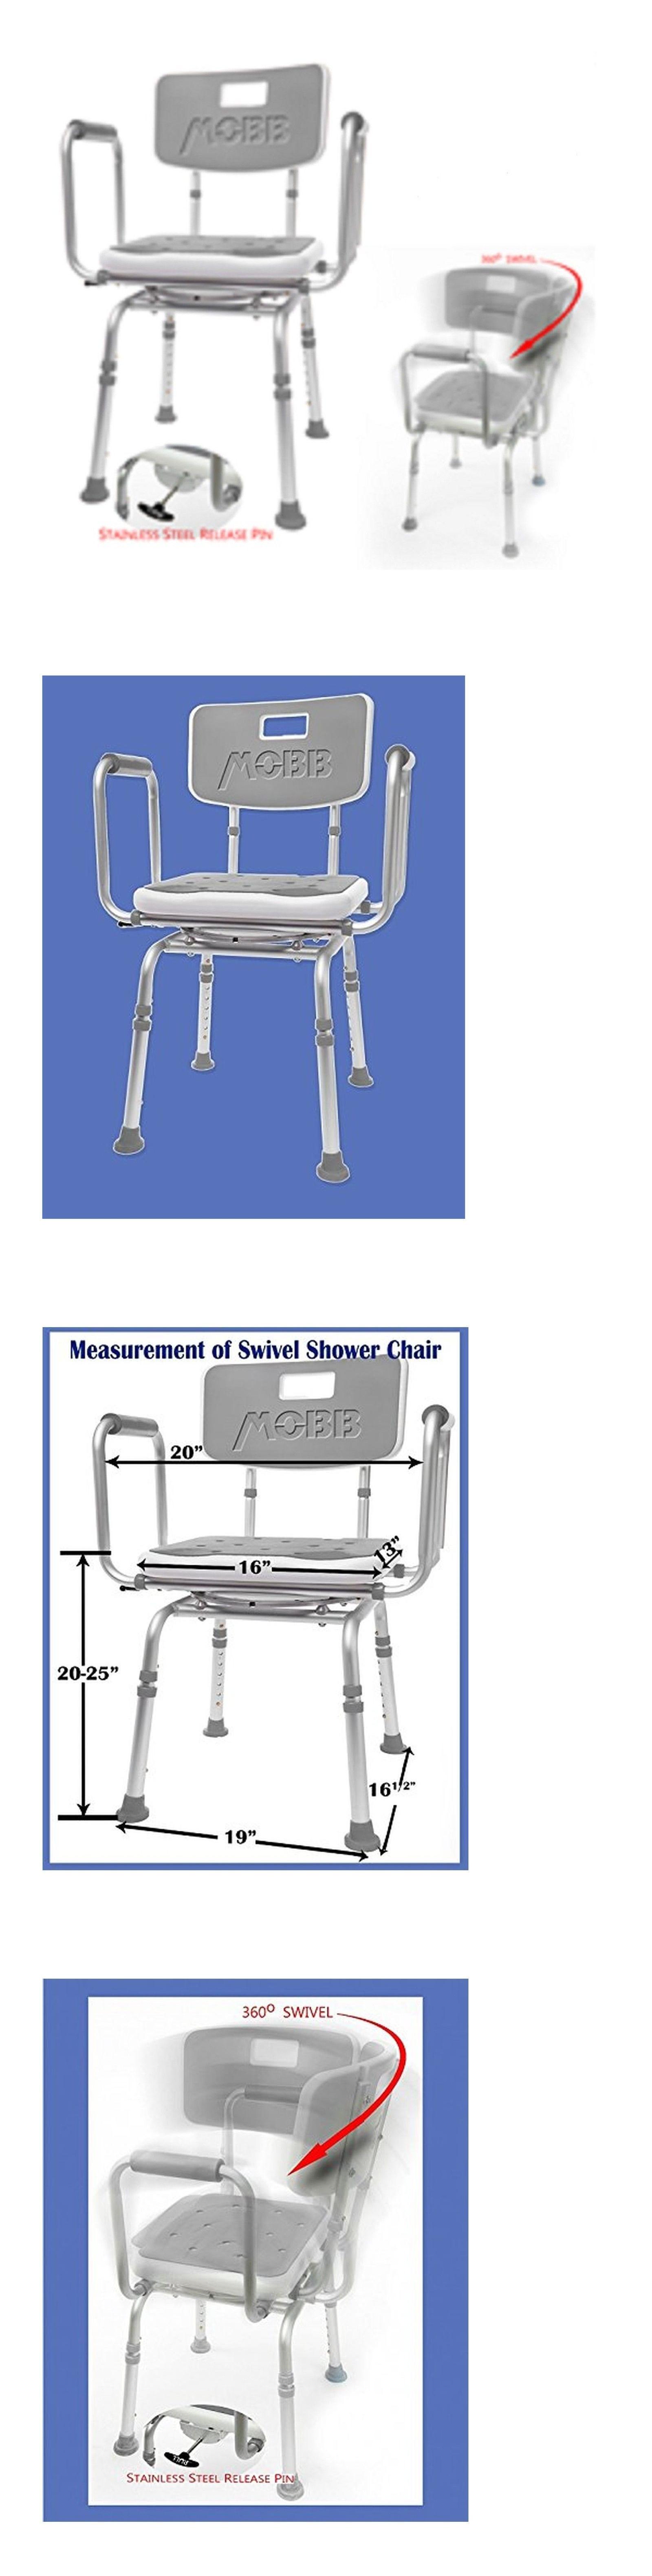 Shower and Bath Seats: Mobb Premium Bathroom Swivel Shower Chair ...